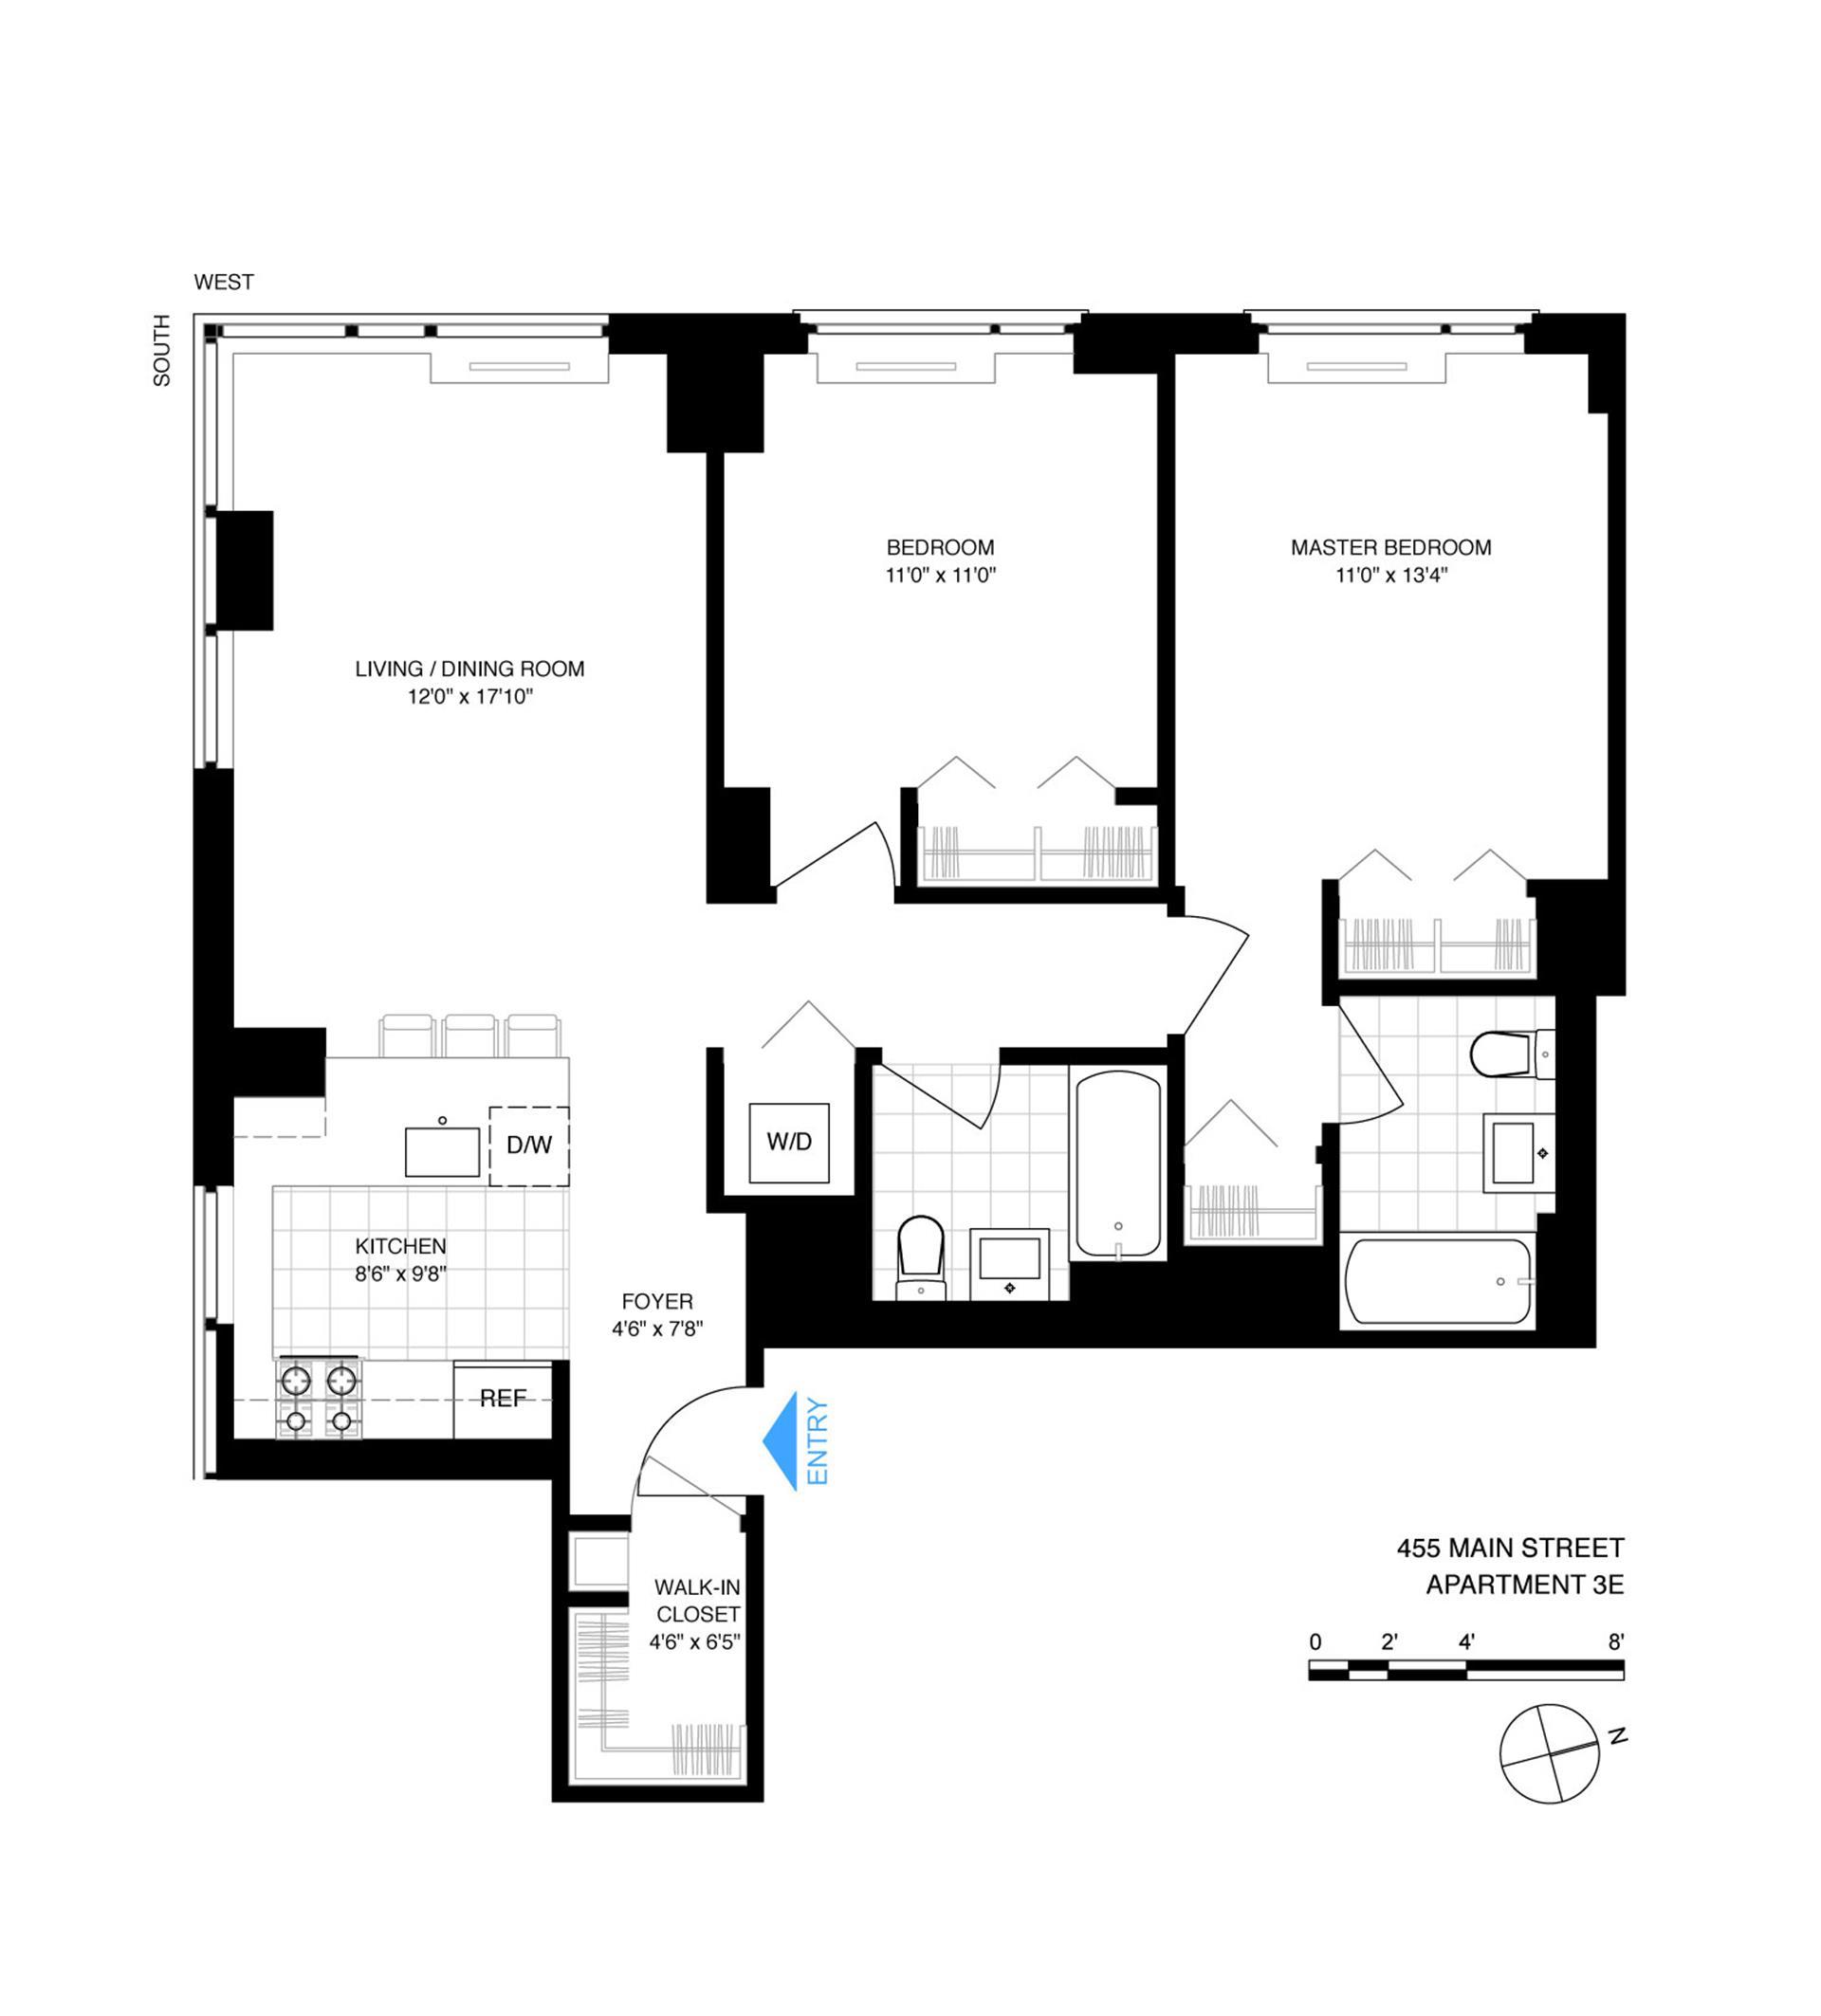 Floor plan of 455 Main St, 3E - Roosevelt Island, New York